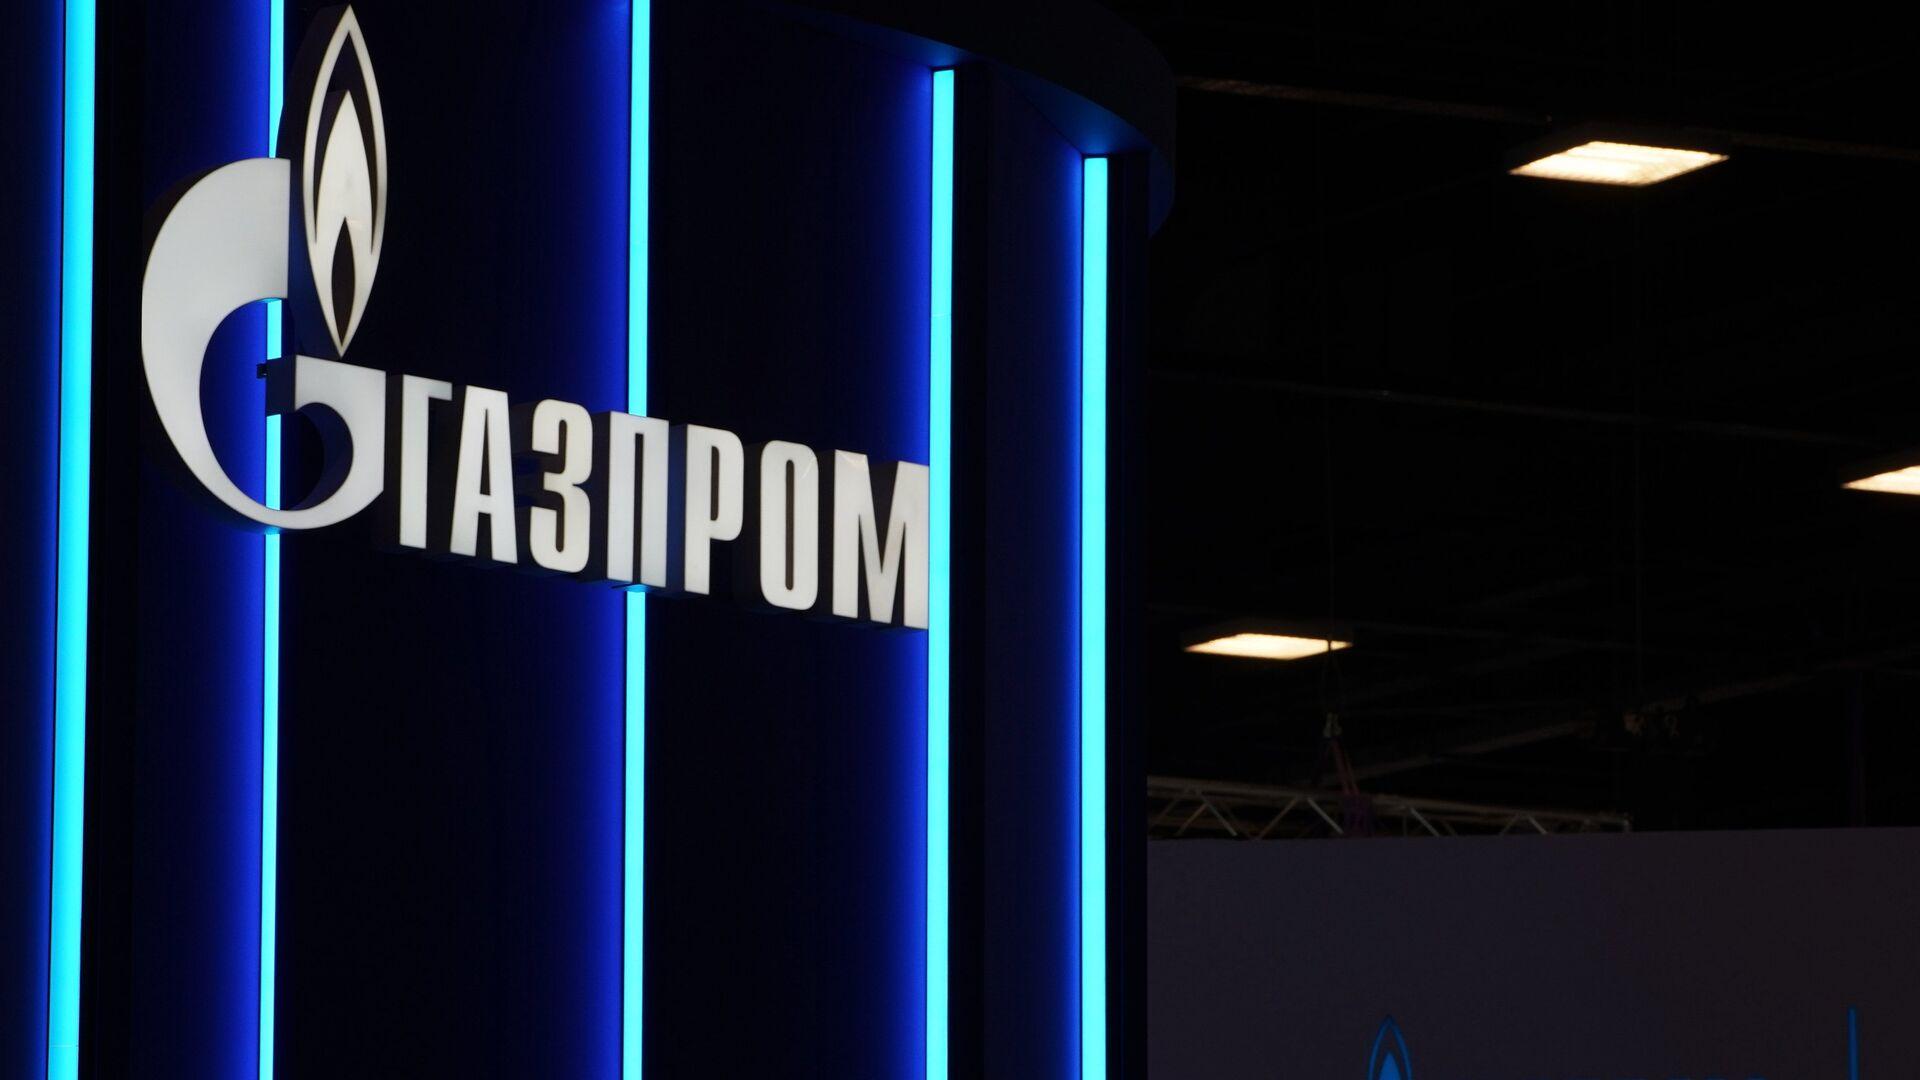 Logo de Gazprom - Sputnik Mundo, 1920, 02.08.2021